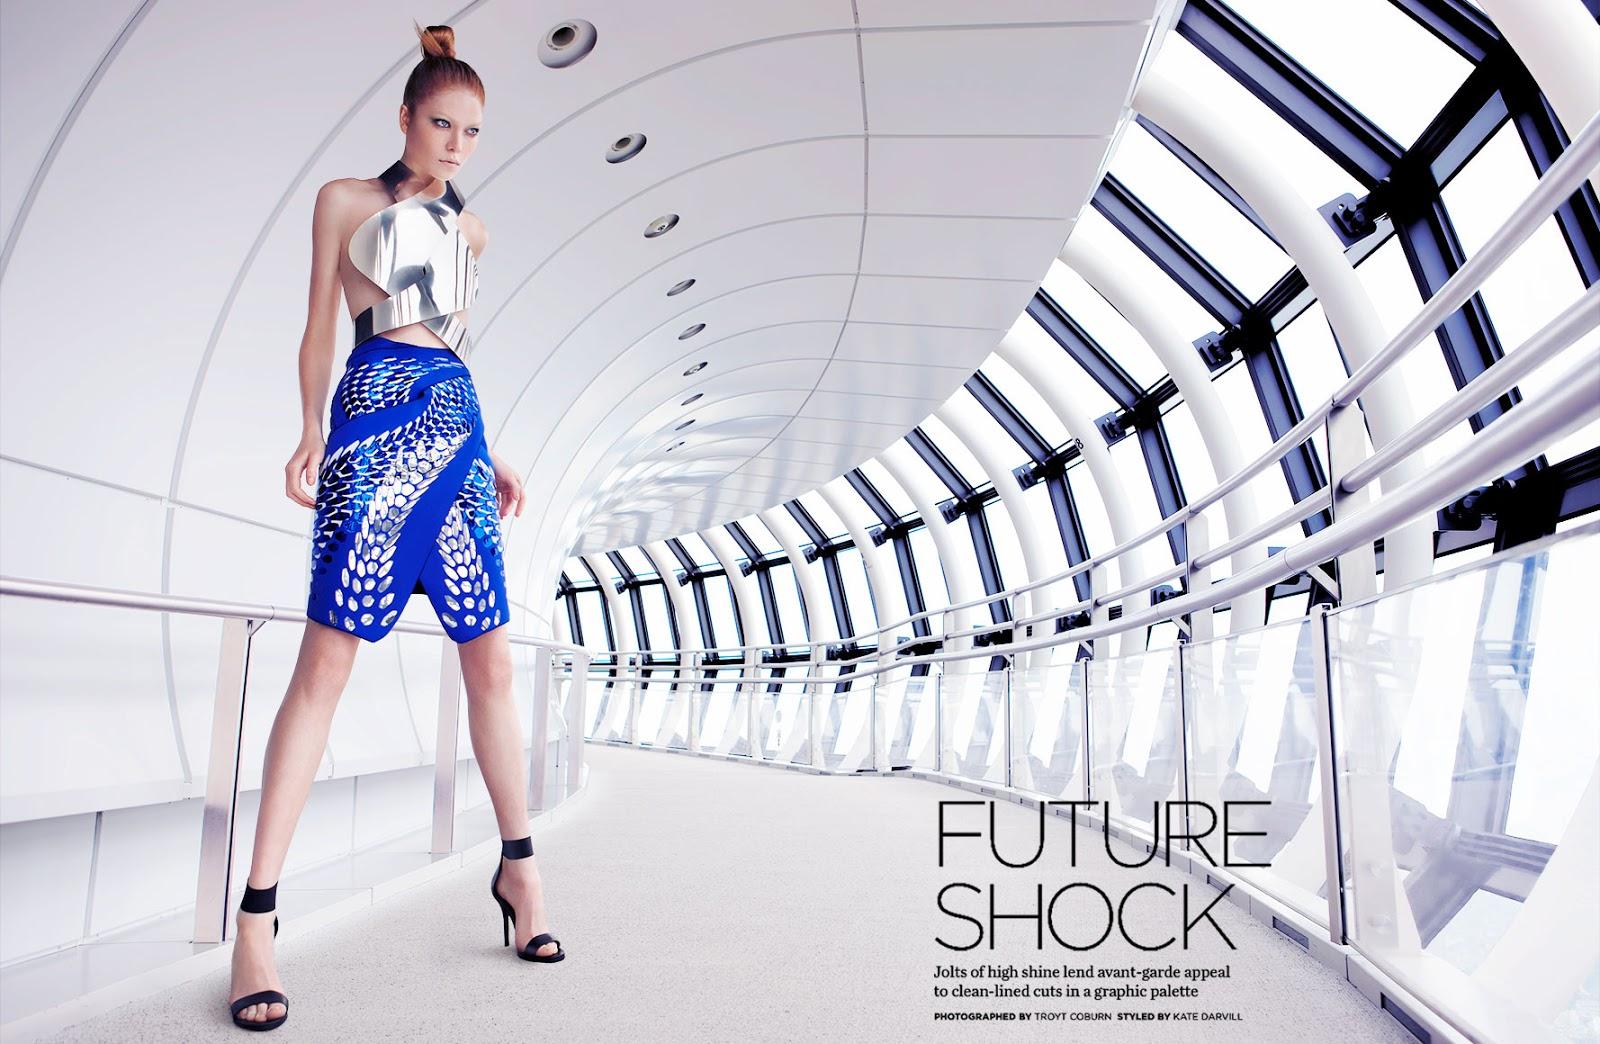 Troyt Coburn - Photography - Future Shock